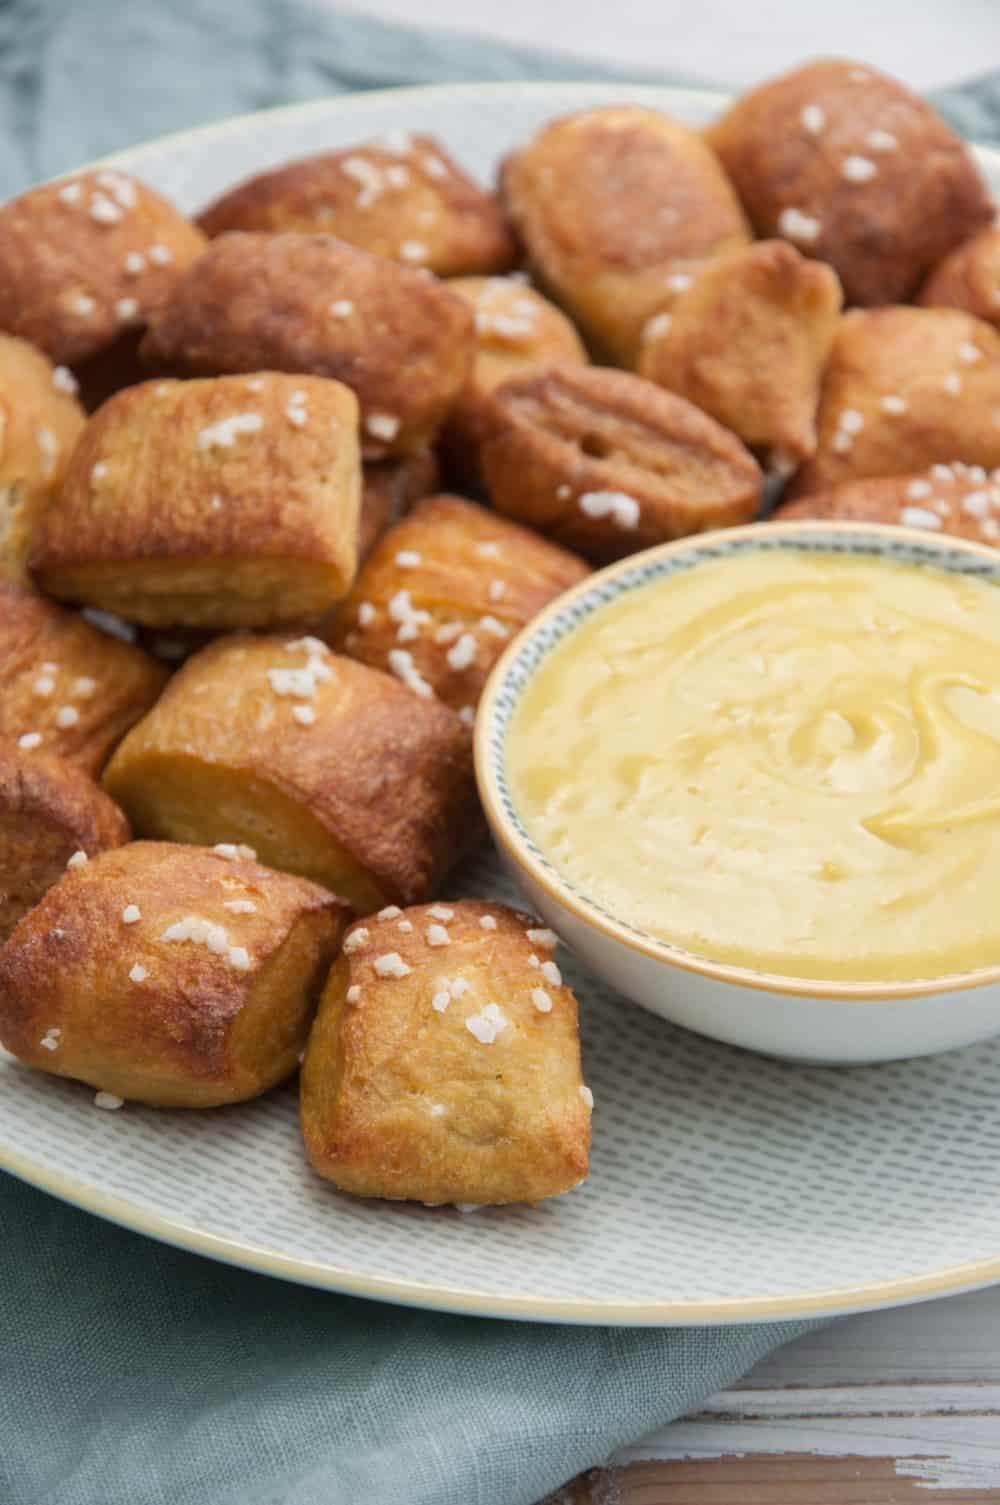 Vegan Soft Pretzels | Cravings Made Vegan Cookbook | WorldofVegan.com | #pretzels #cravings #cookbook #softpretzel